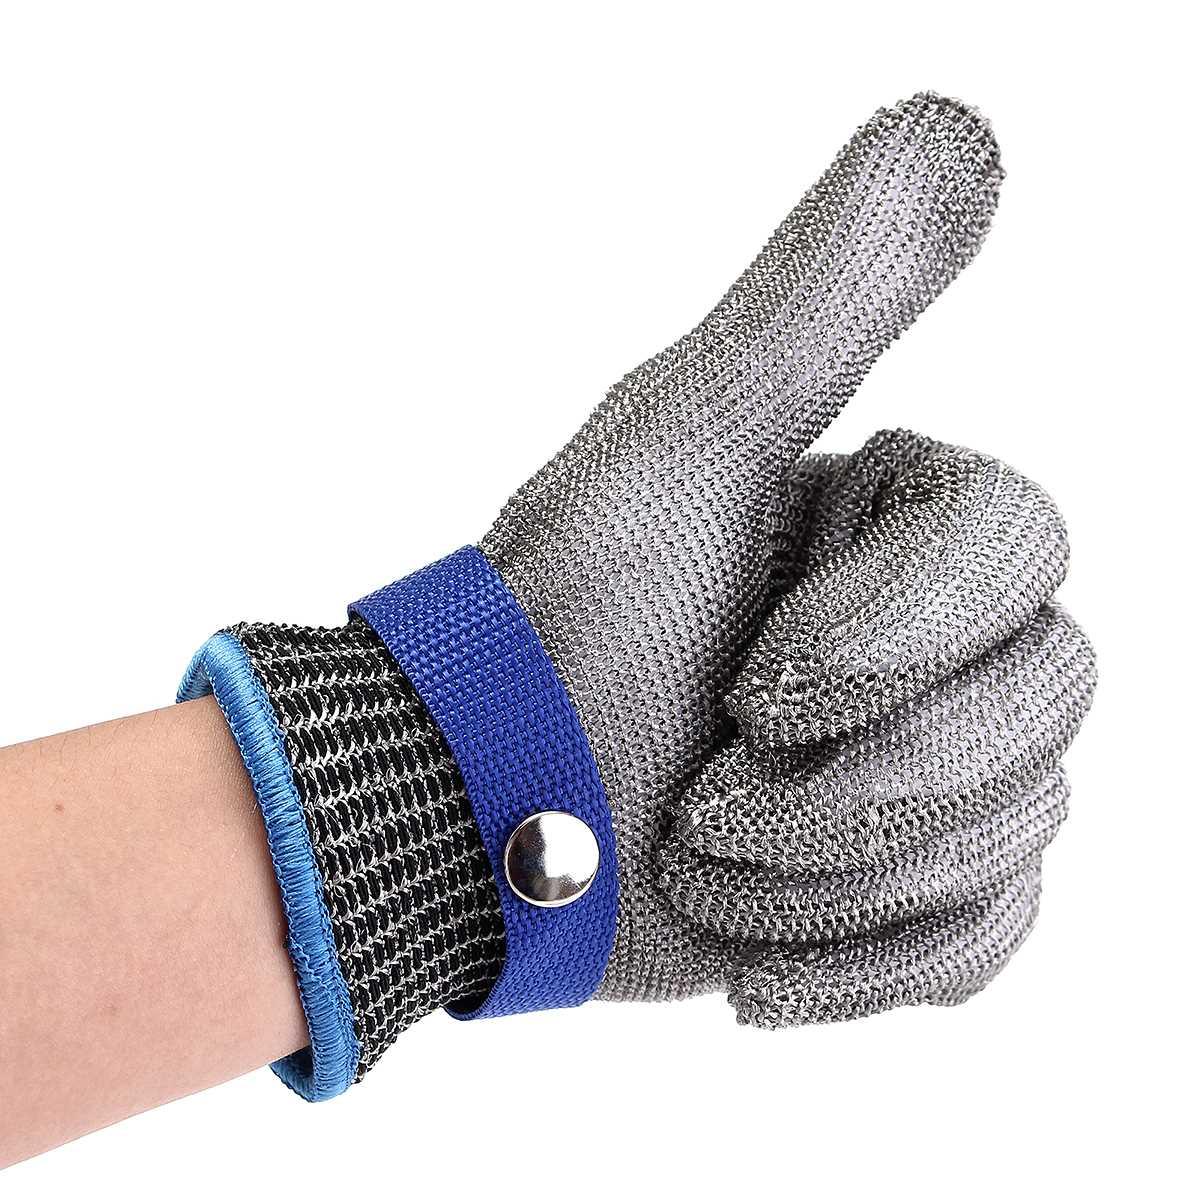 Langlebige Qualität Sicherheit Cut Proof Schützen Handschuh 100% Edelstahl Metall Mesh Butcher Handschuhe Klasse 5 Sicherheit 23x9,5 cm Größe M